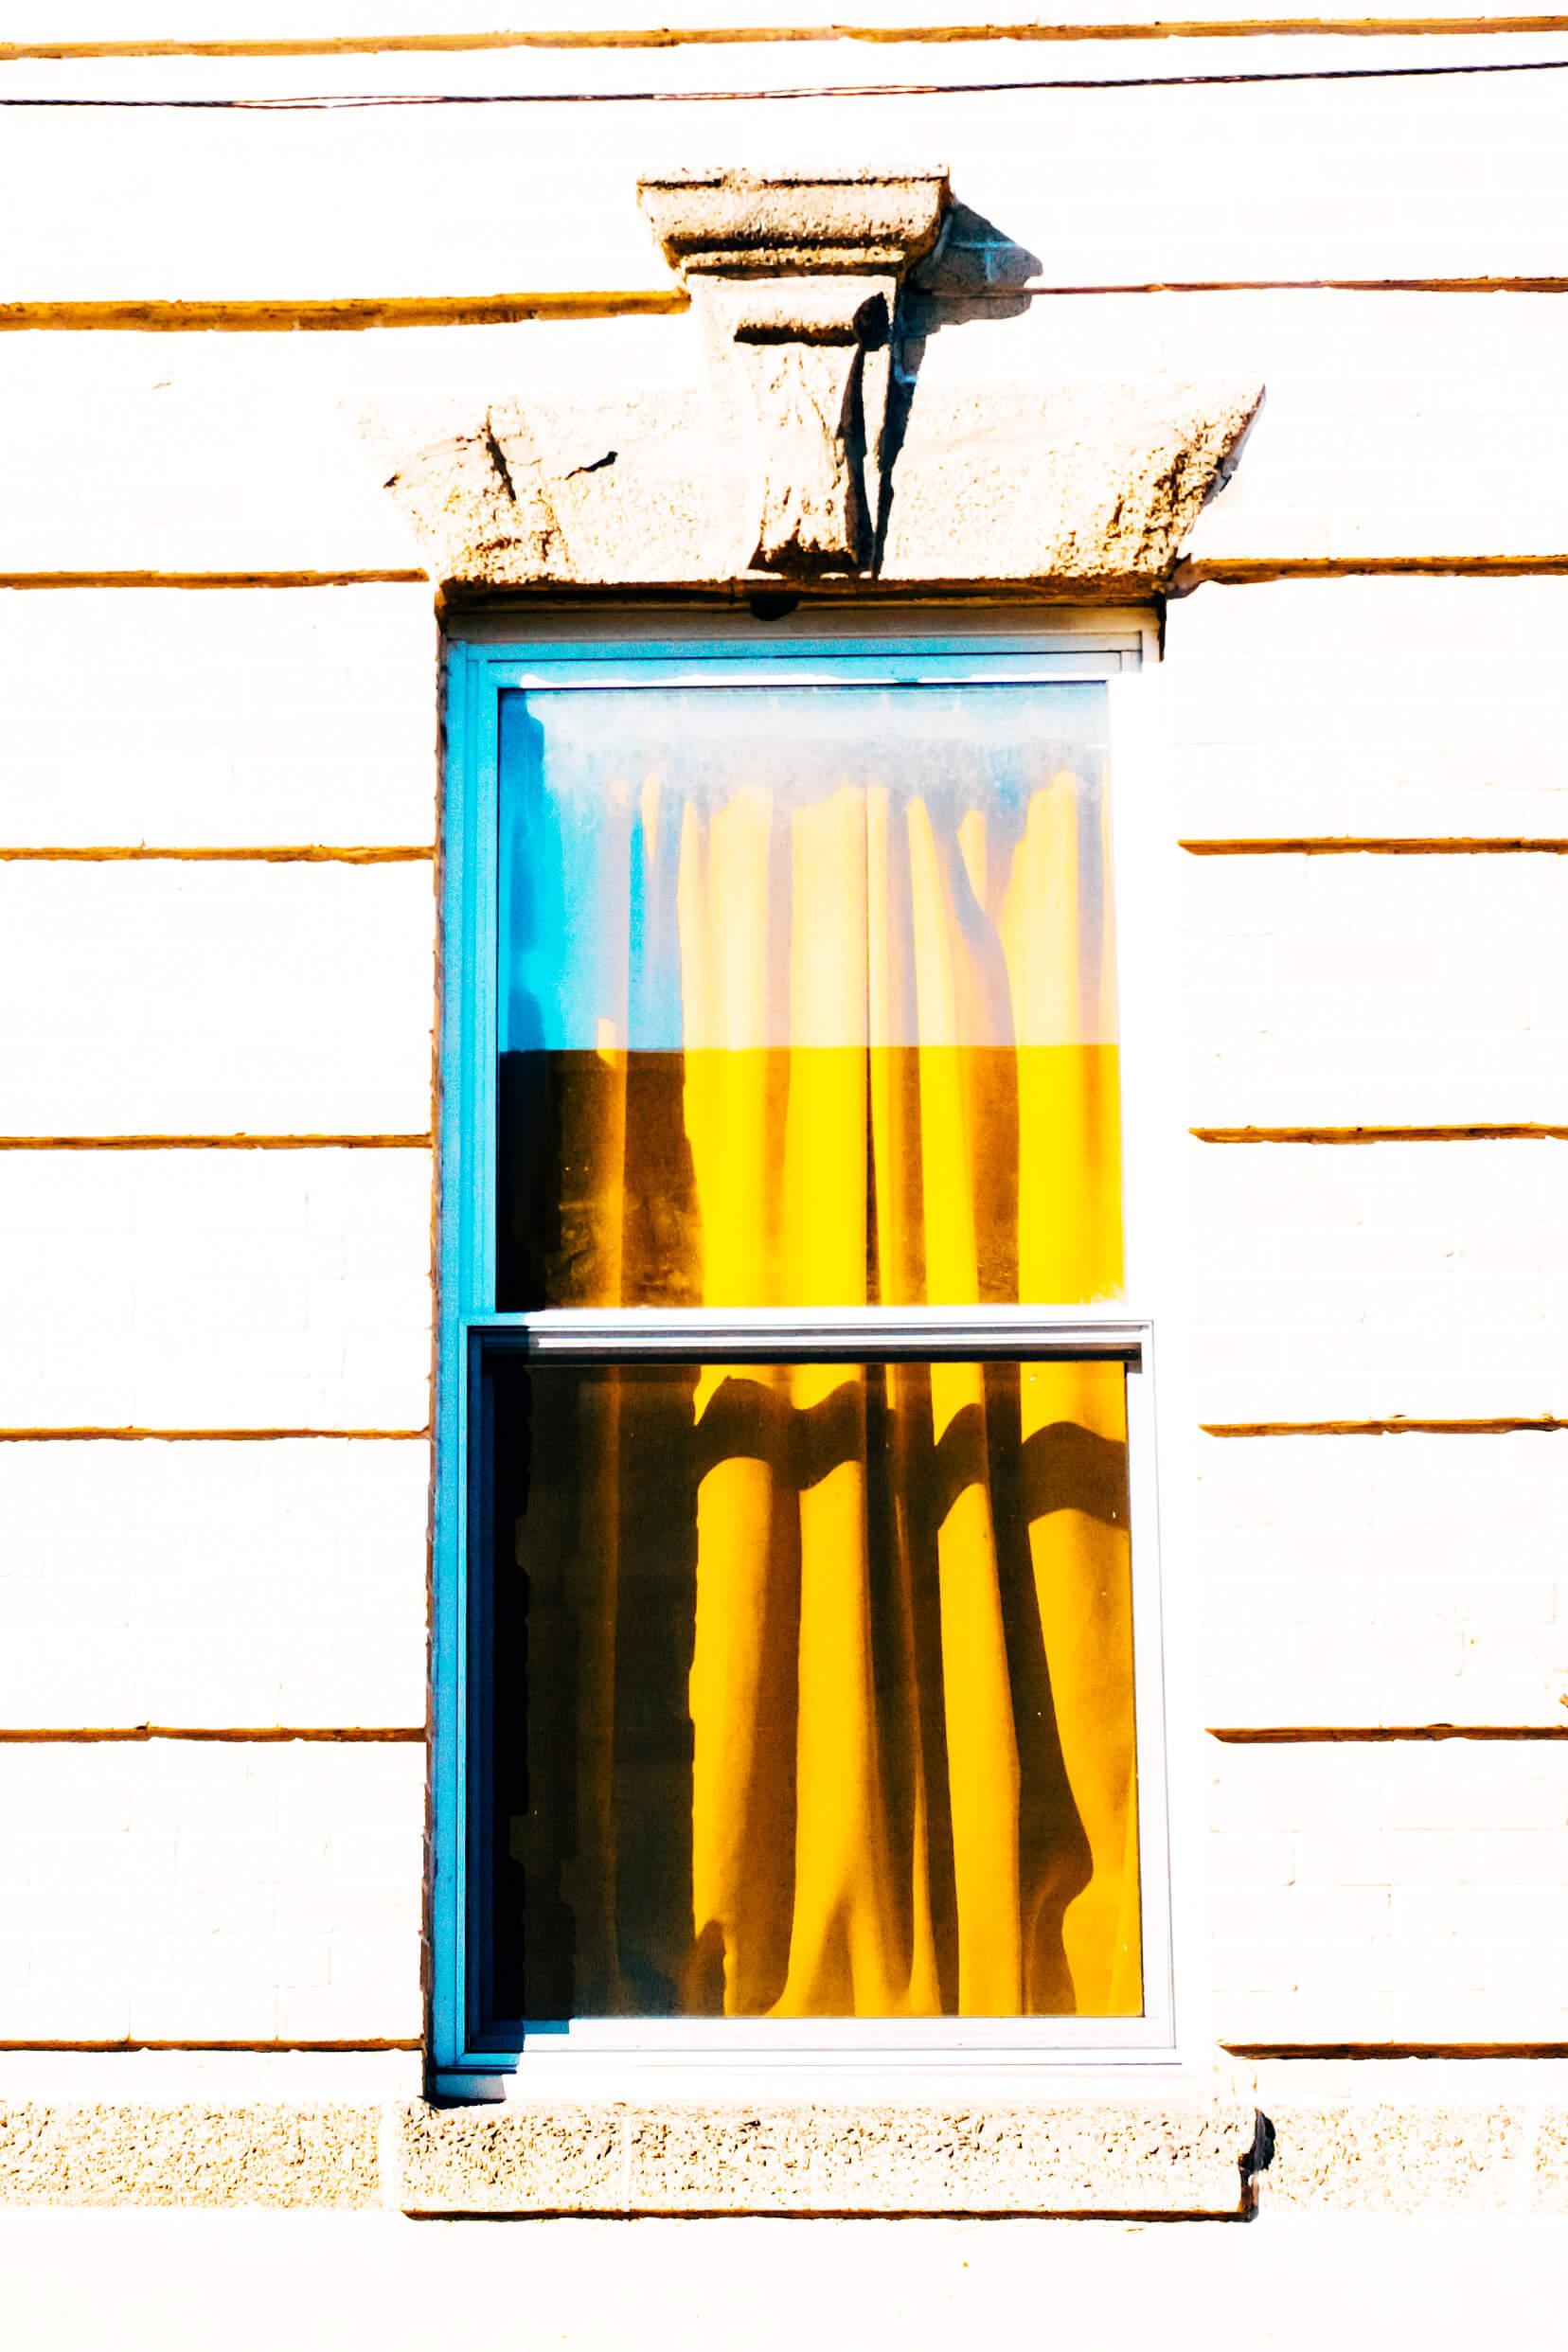 strangers-windows-yellow-curtain.jpg